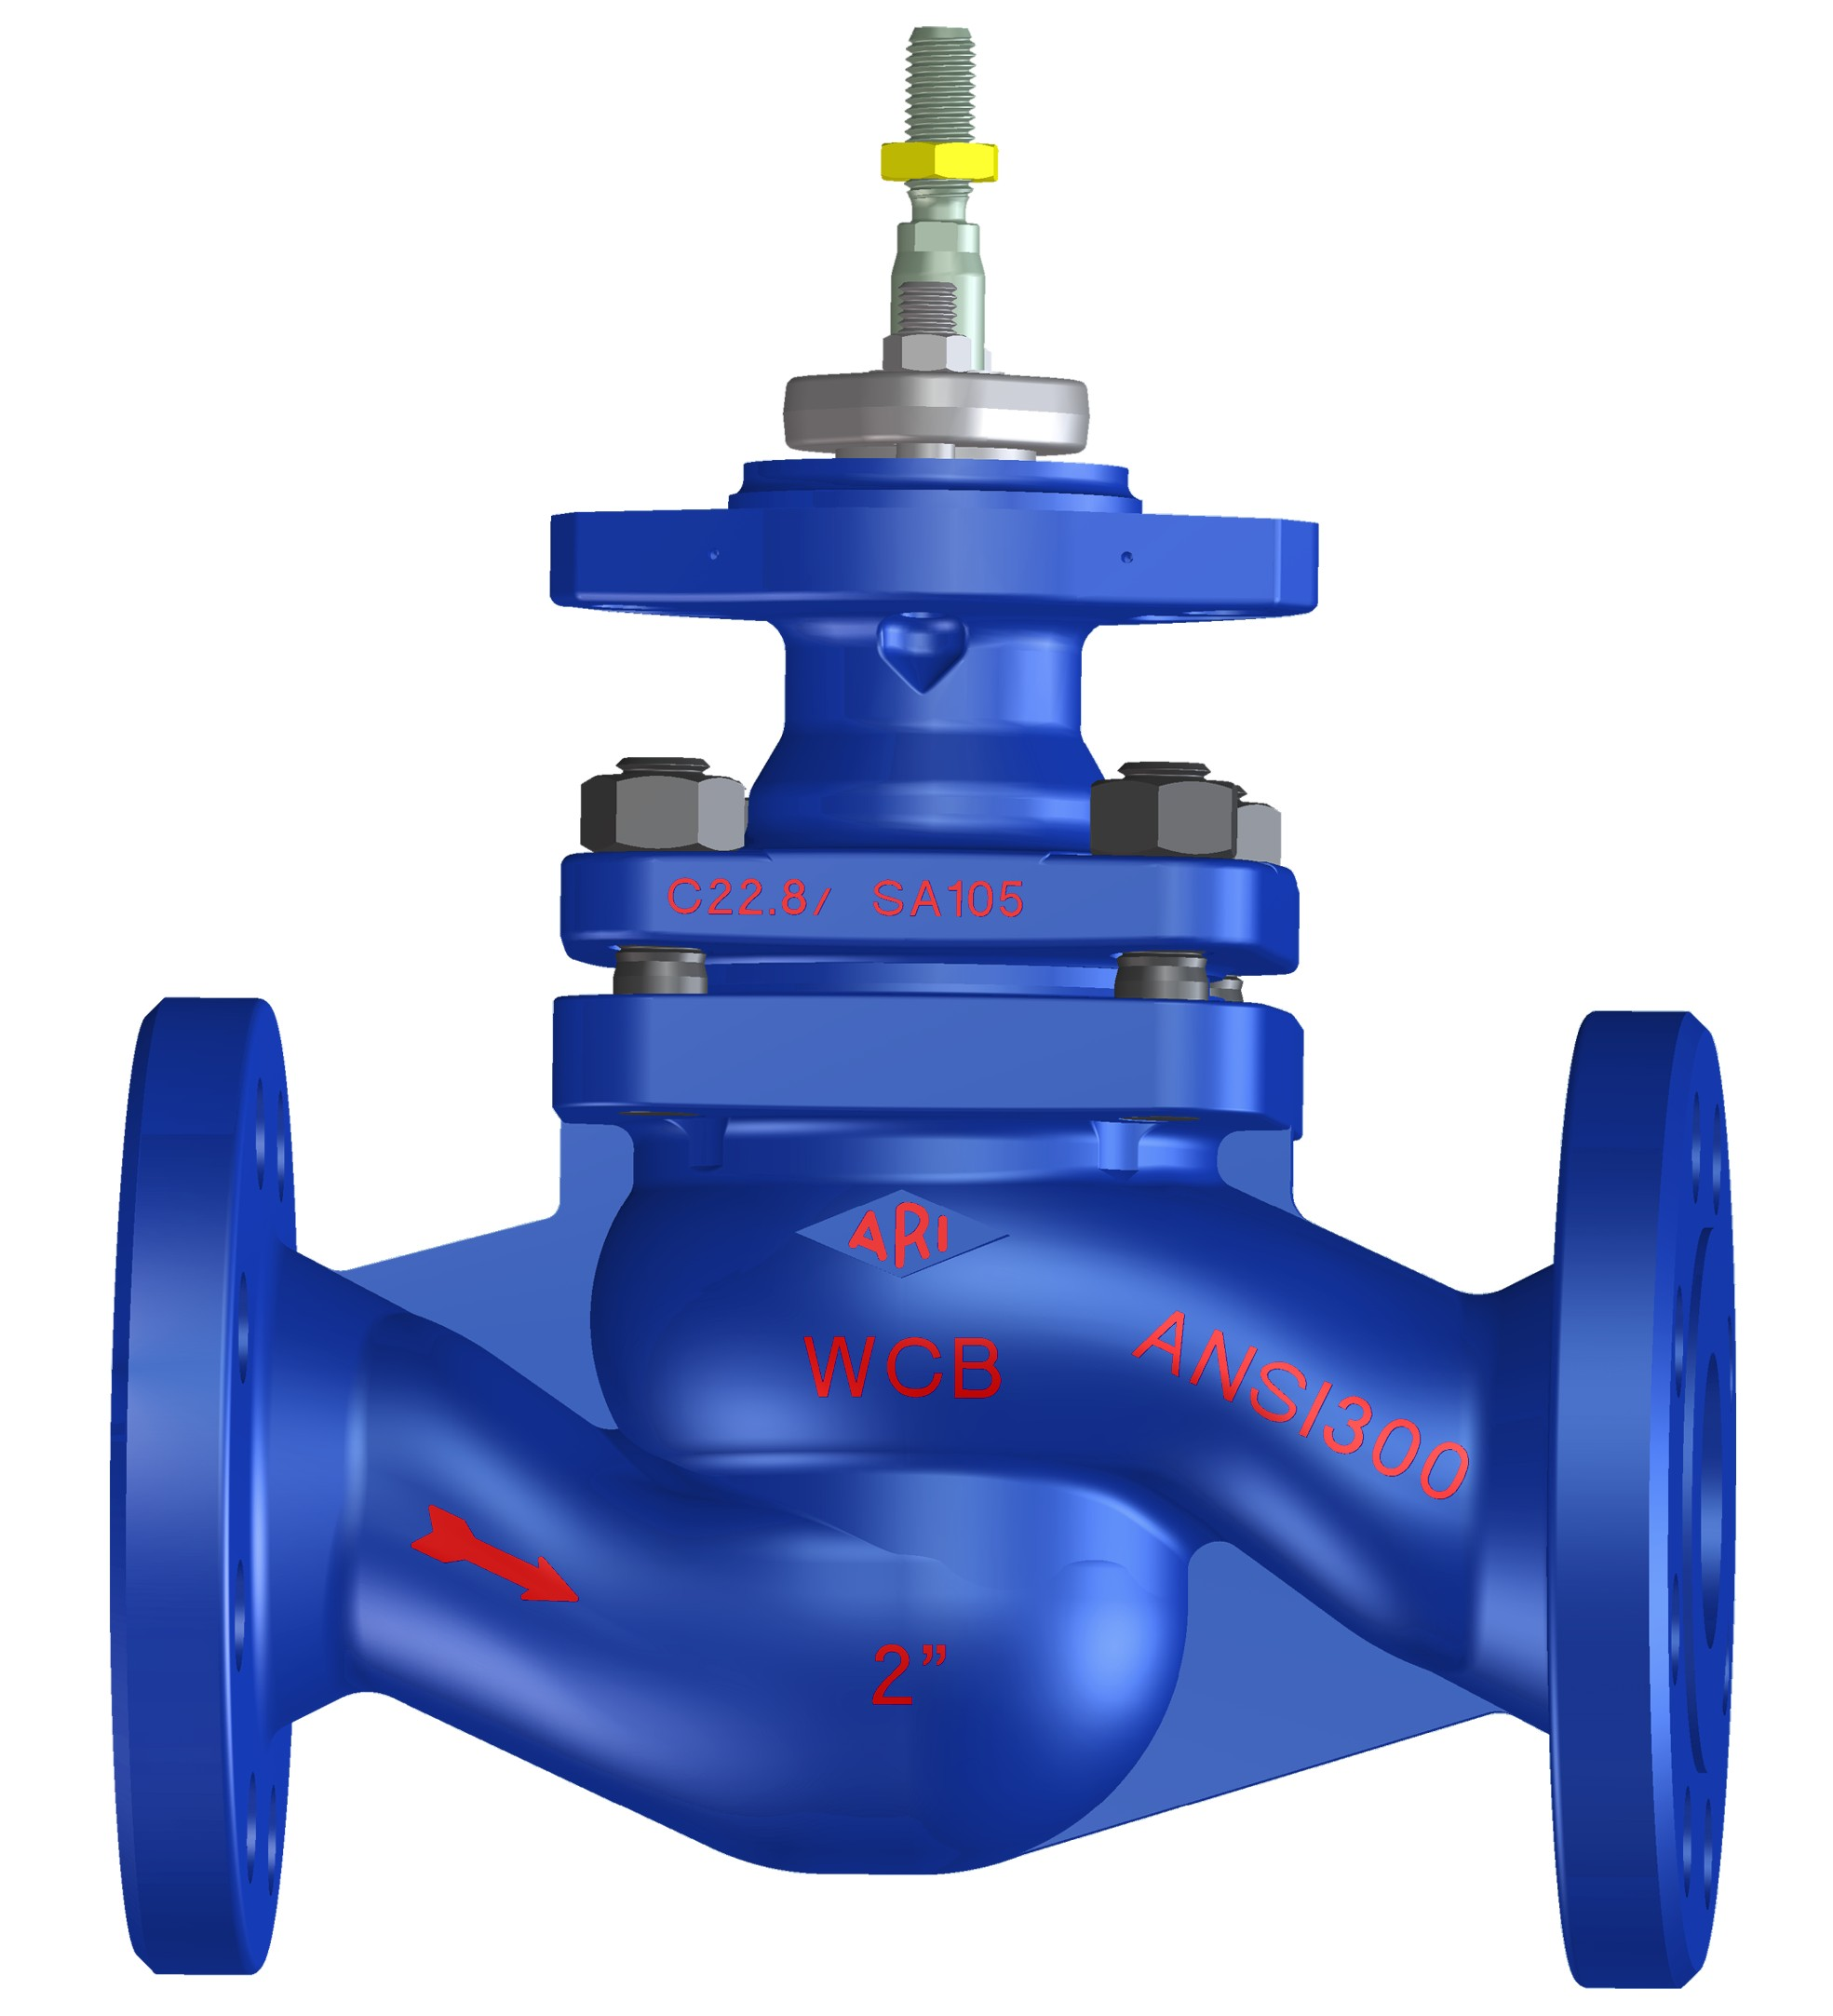 Разработка конструкции привода S-образного регулирующего клапана